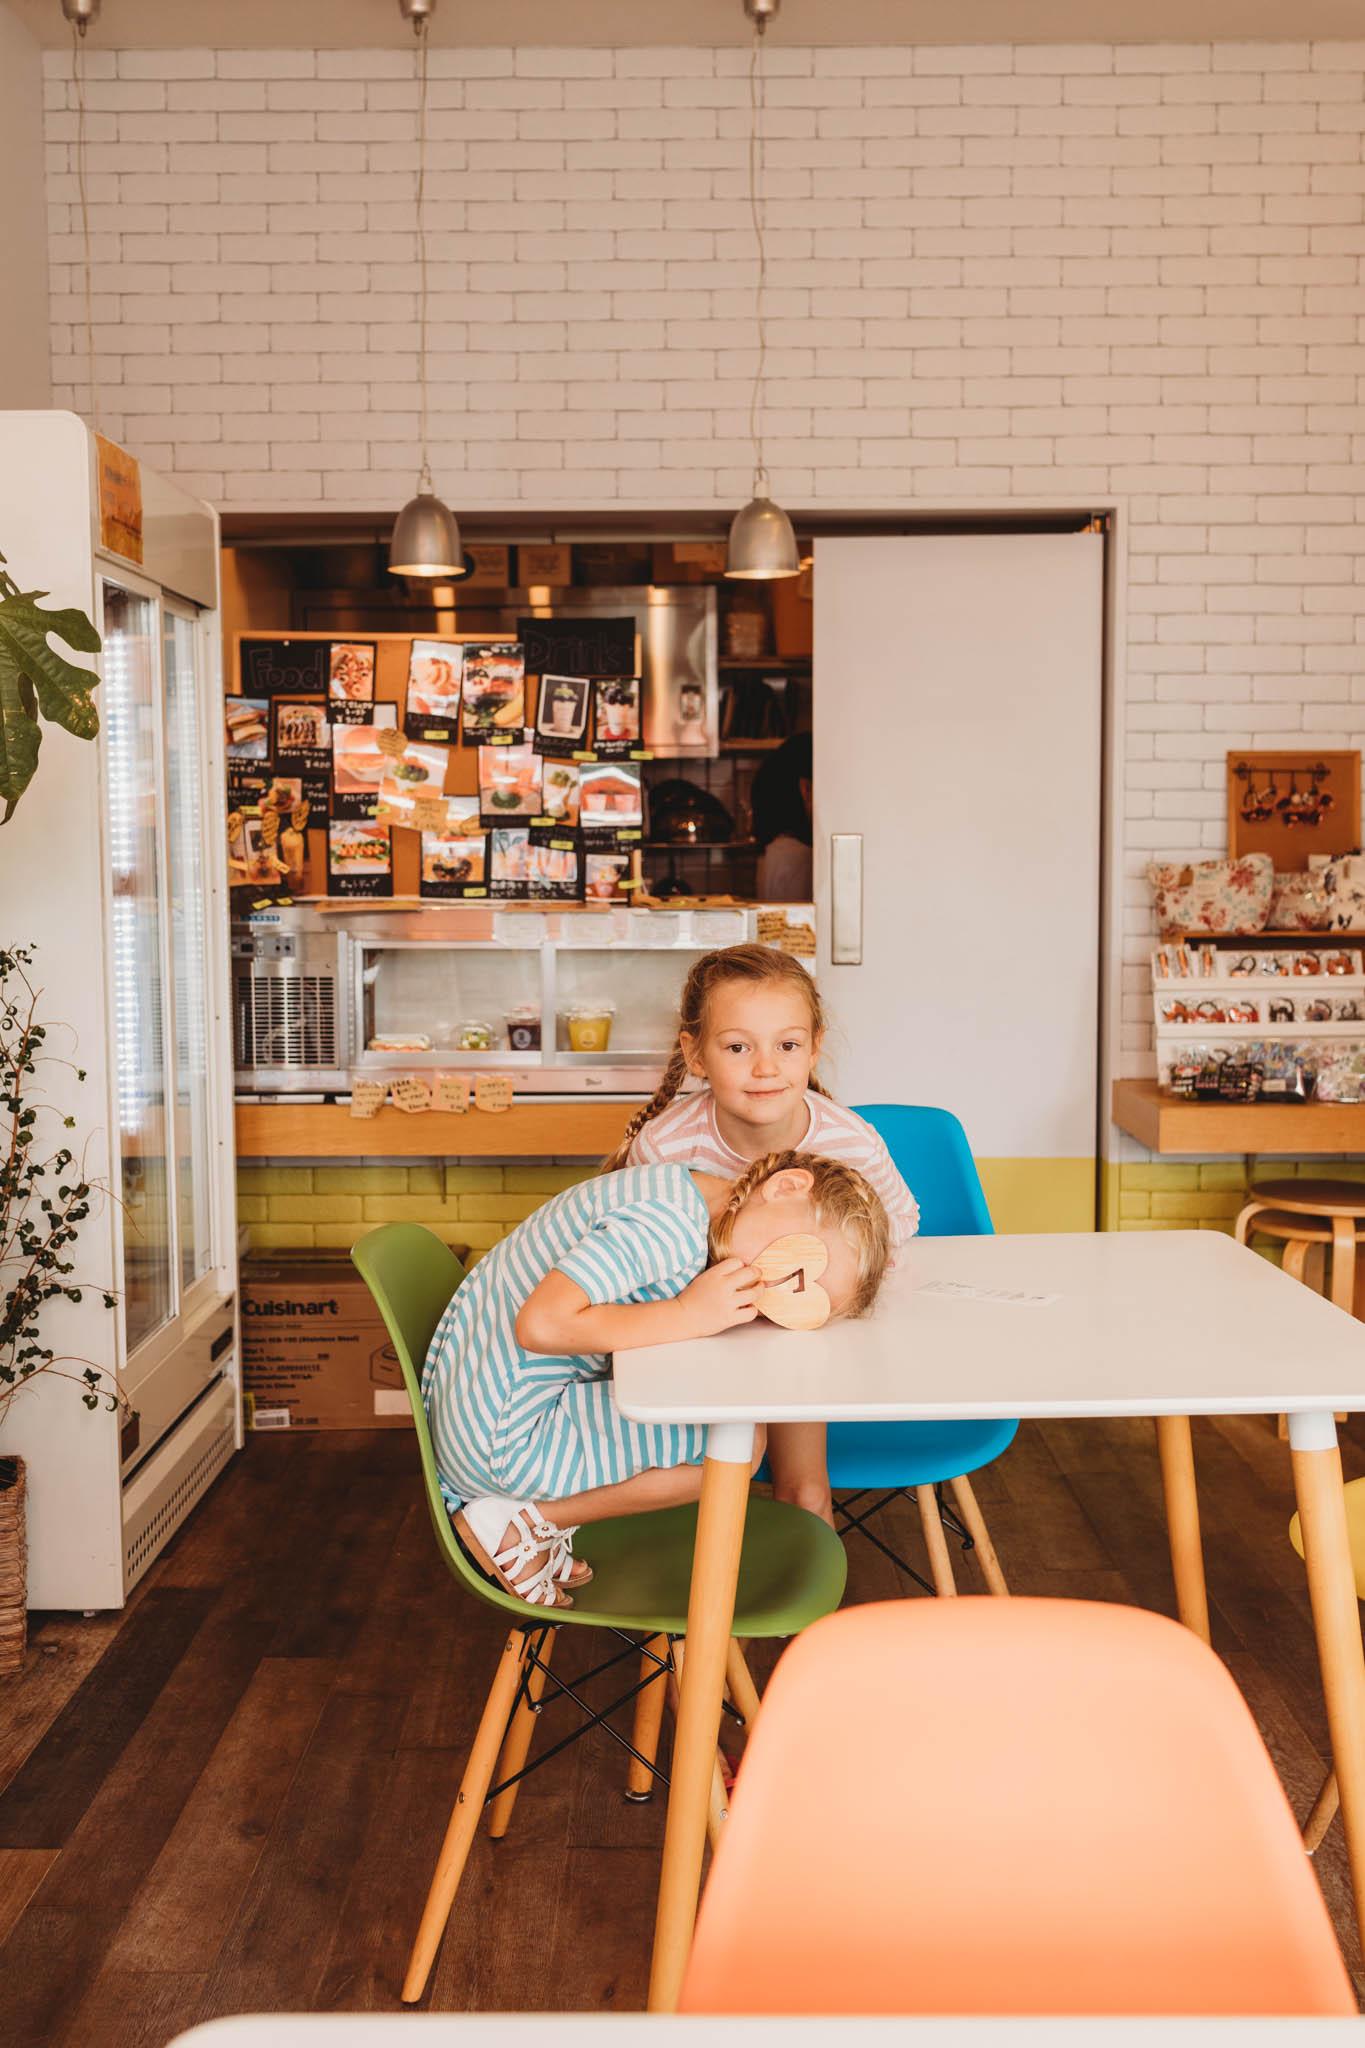 move next door to VegeTrip for fruit smoothies